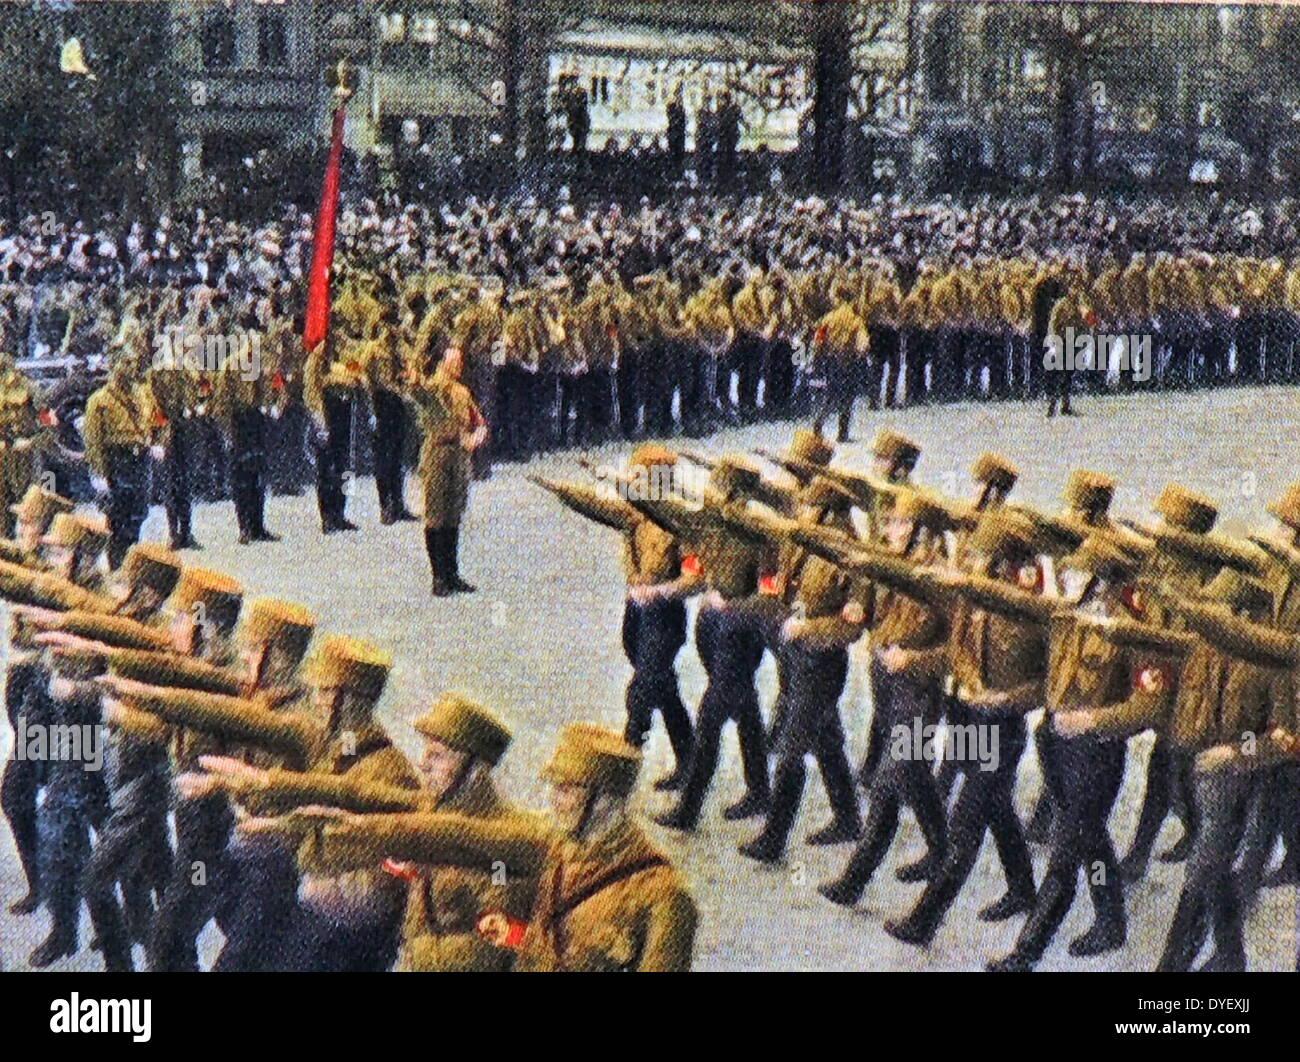 Nazi brownshirts march through Braunschweig 1932 - Stock Image